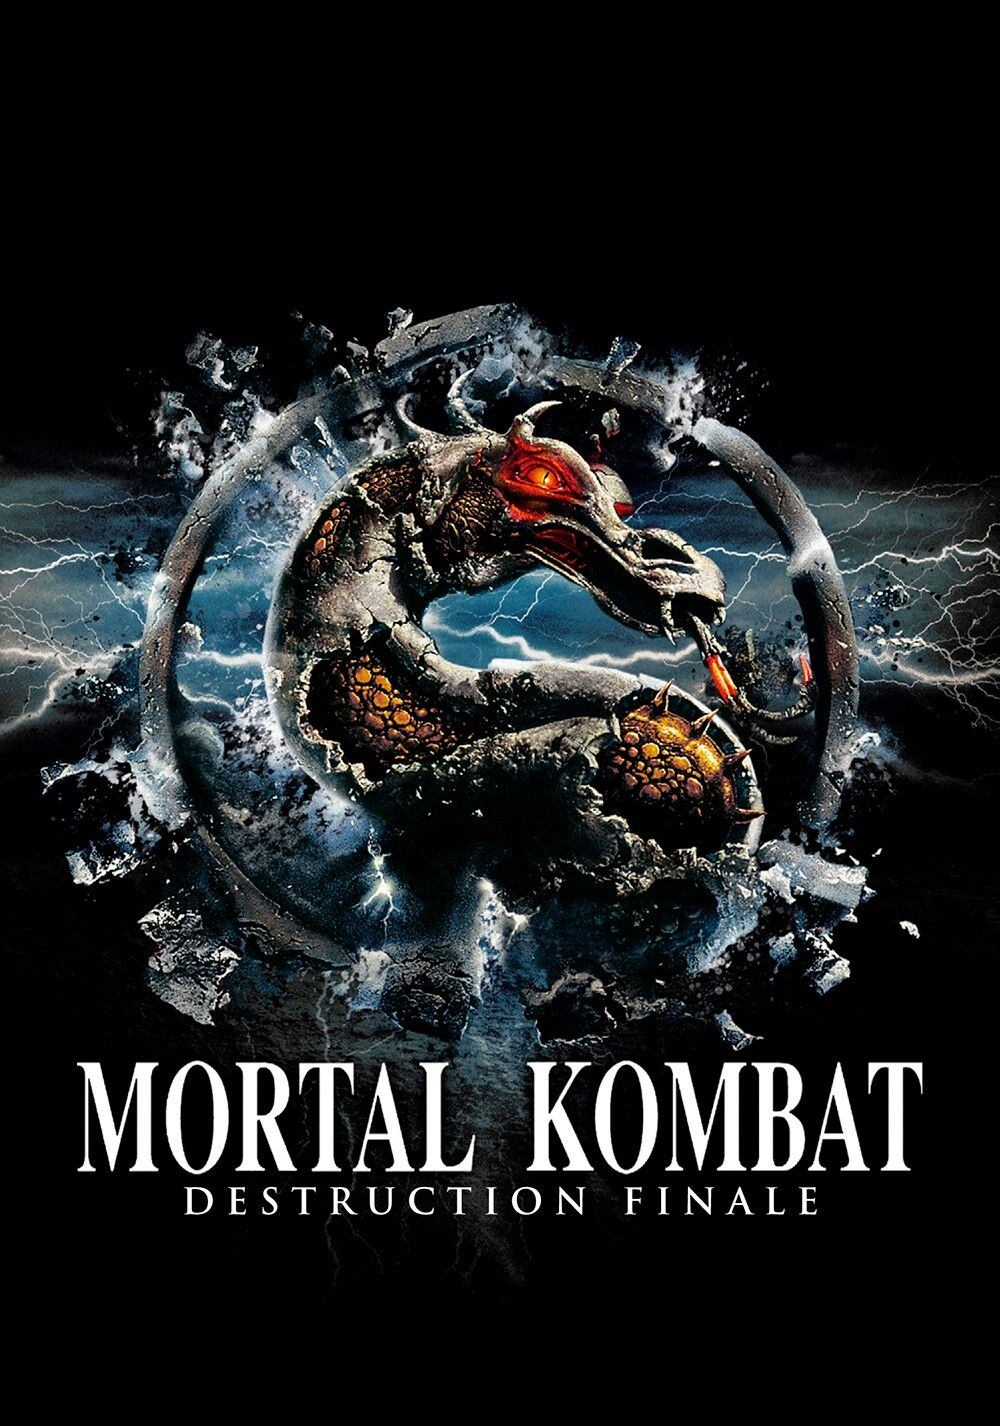 Mortal Kombat 2 Annihilation